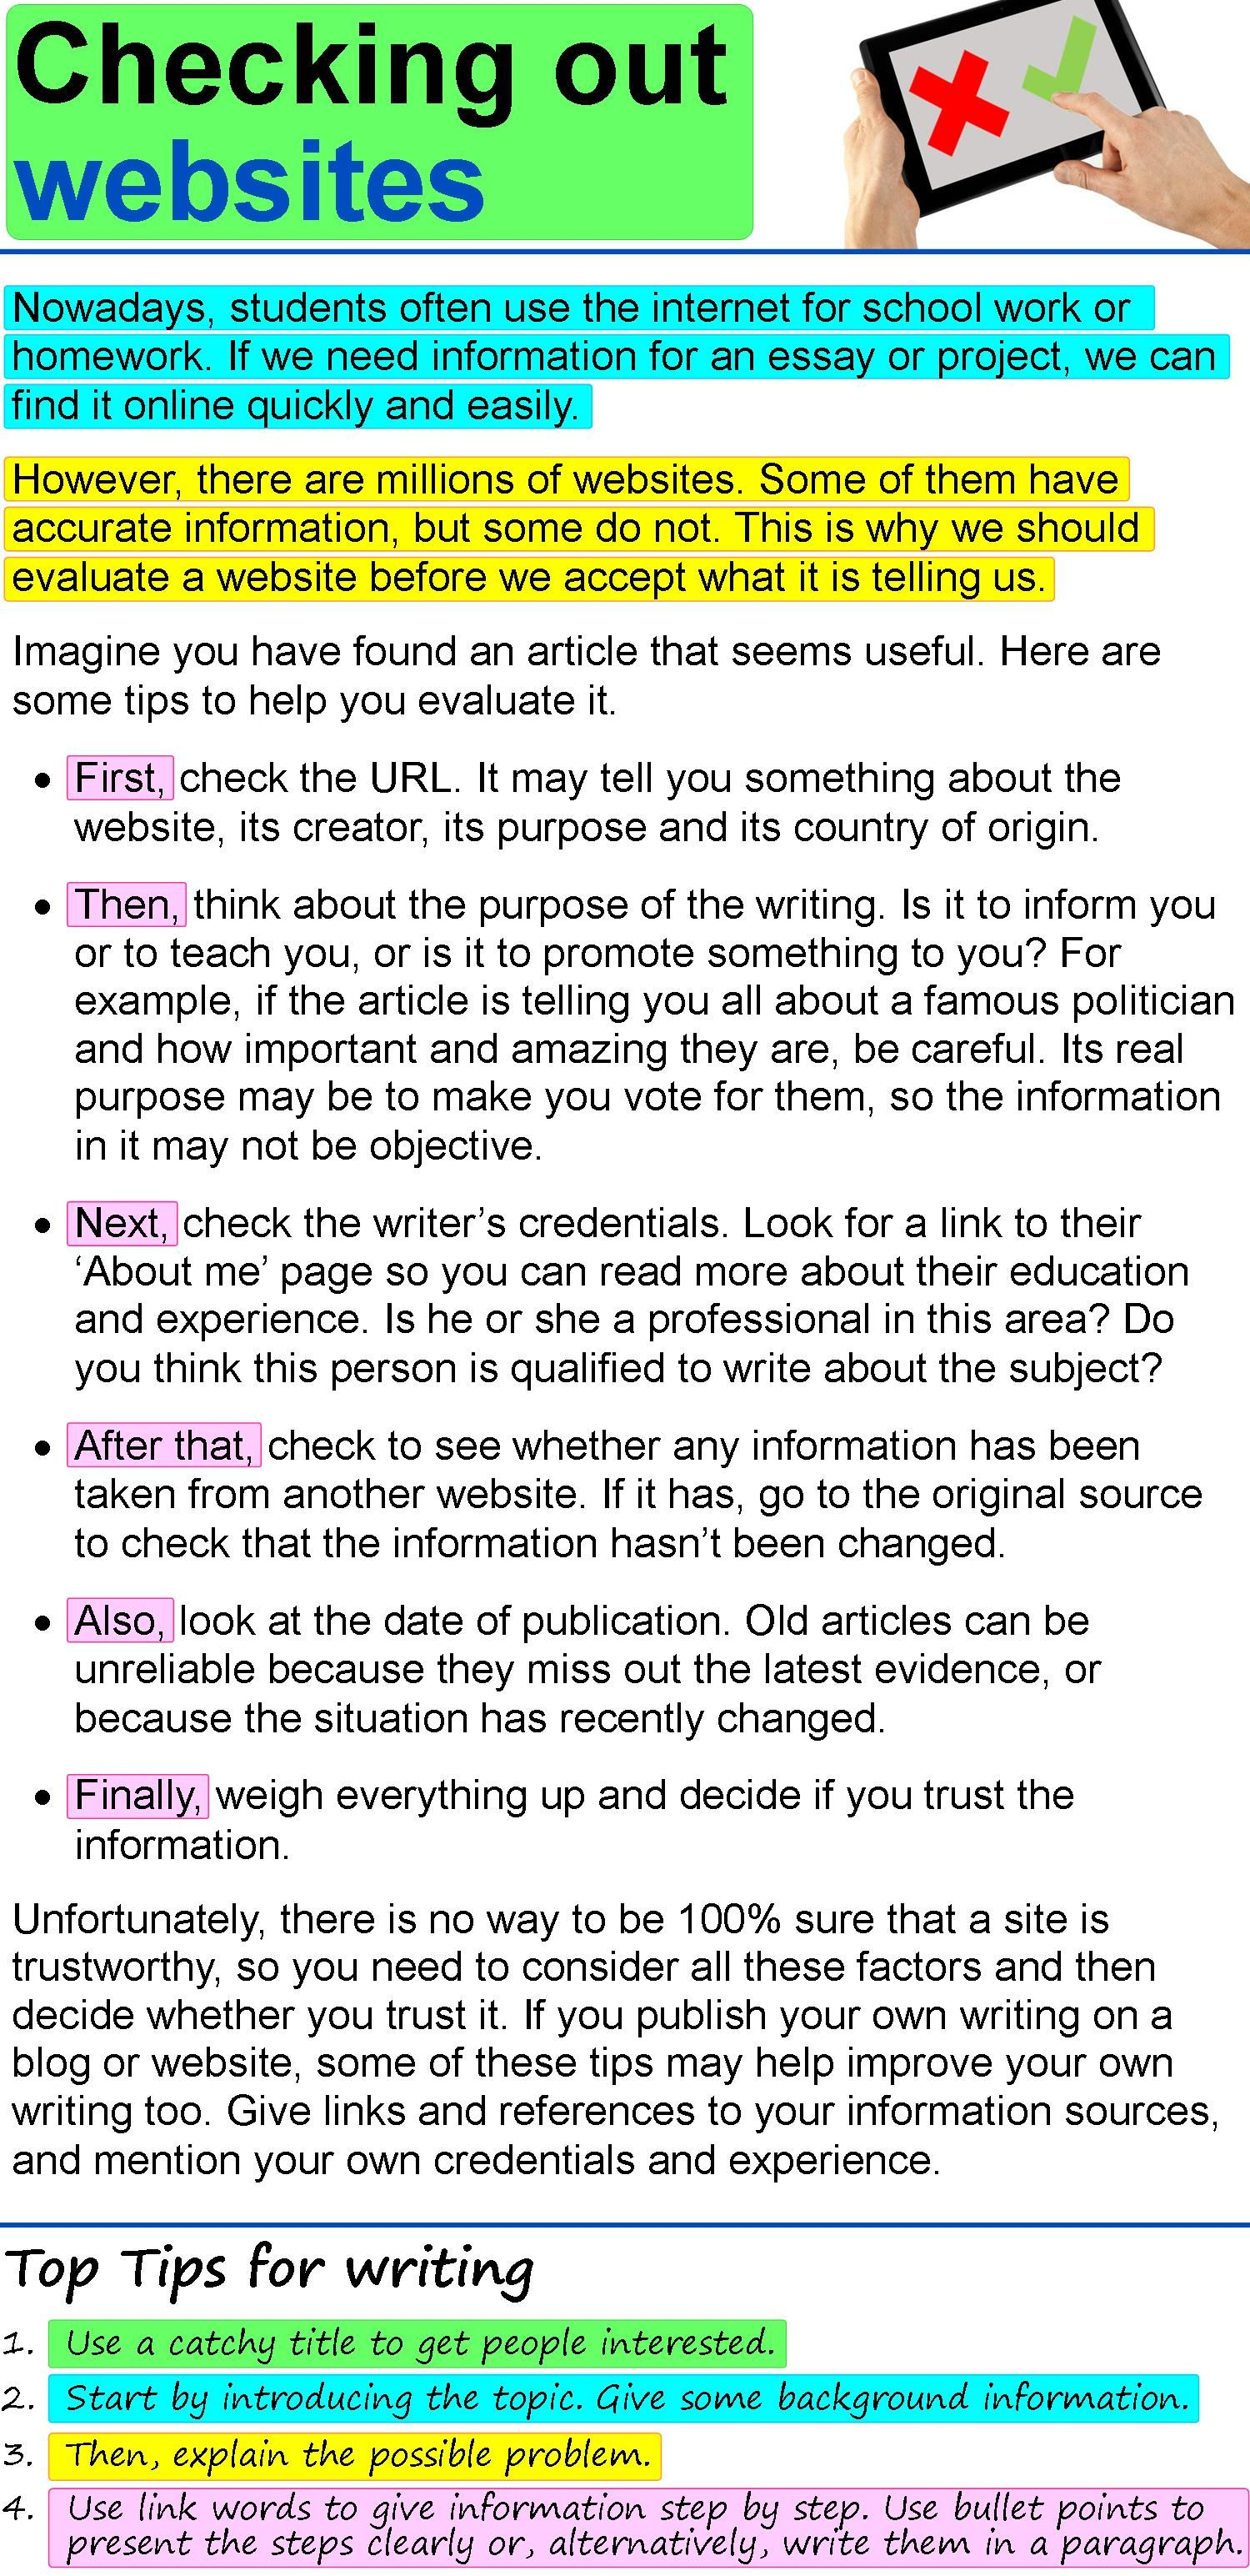 Checking Out Website Ielt Writing Toefl Essay On Trust